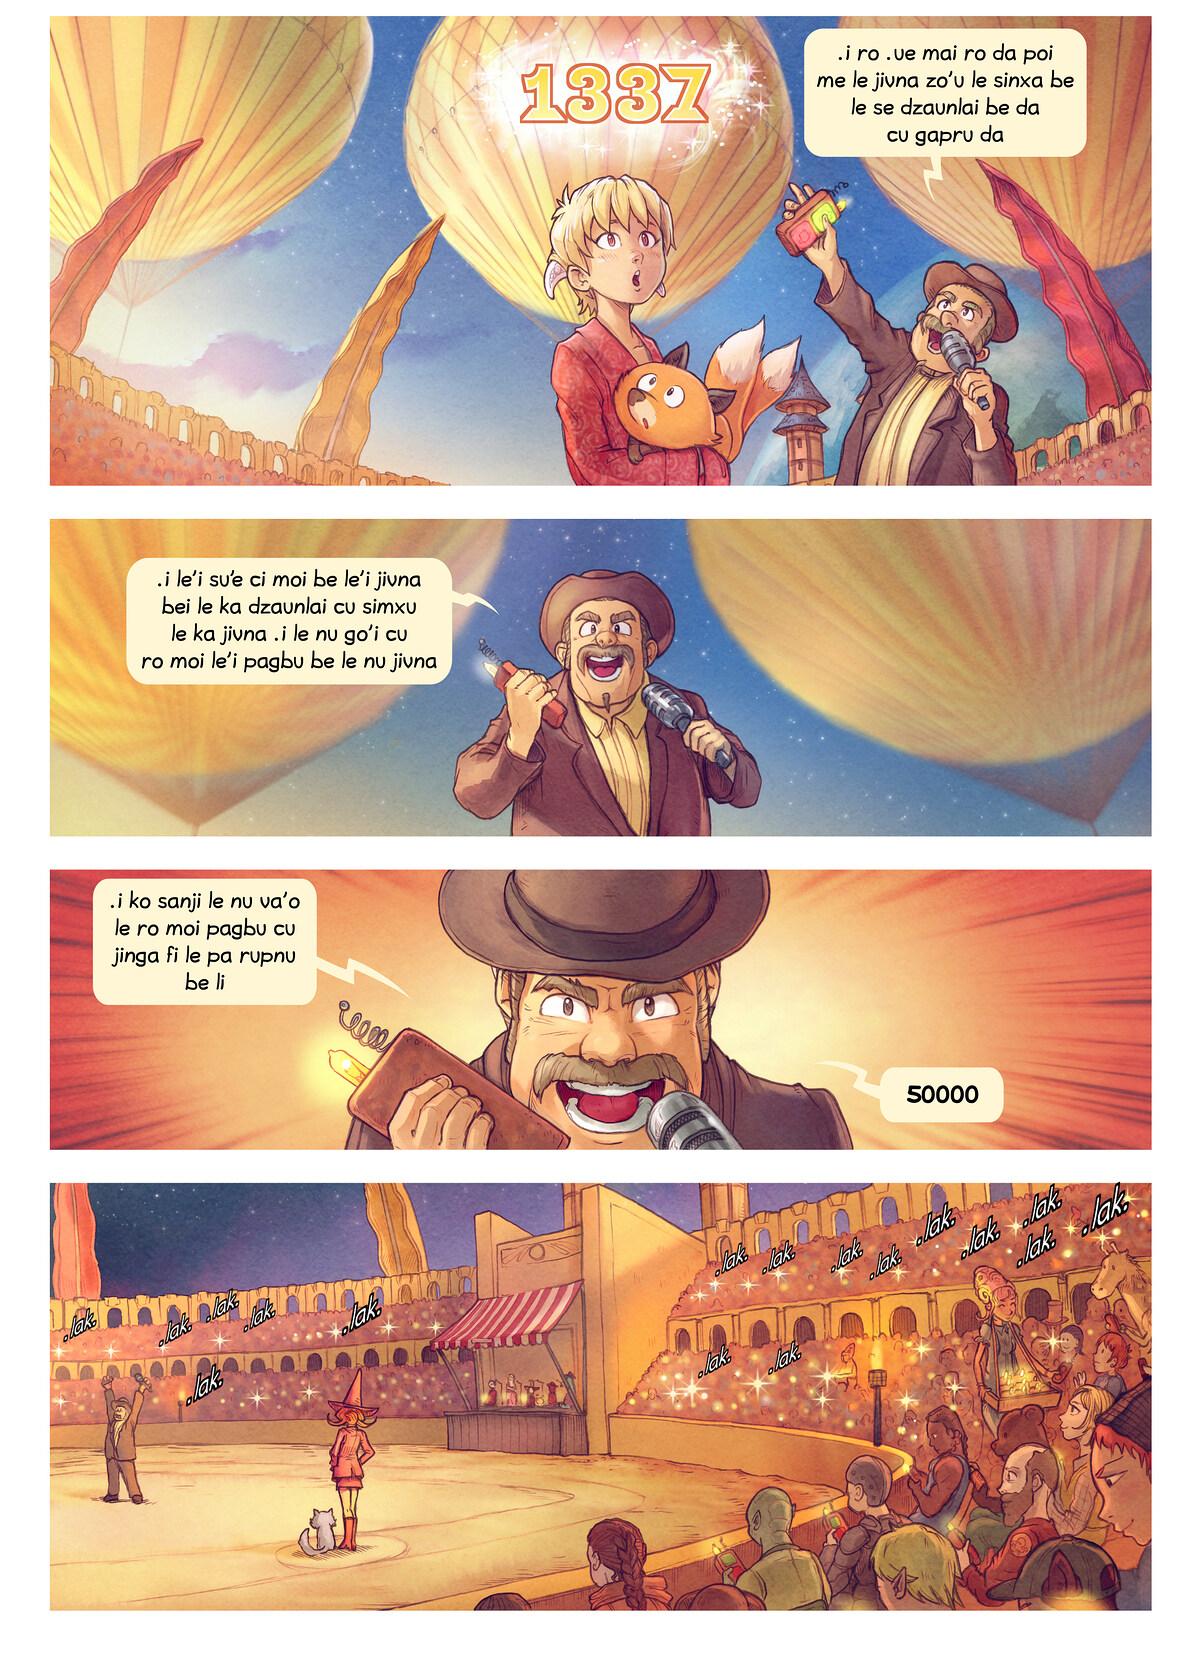 A webcomic page of Pepper&Carrot, pagbu 22 [jb], papri 3